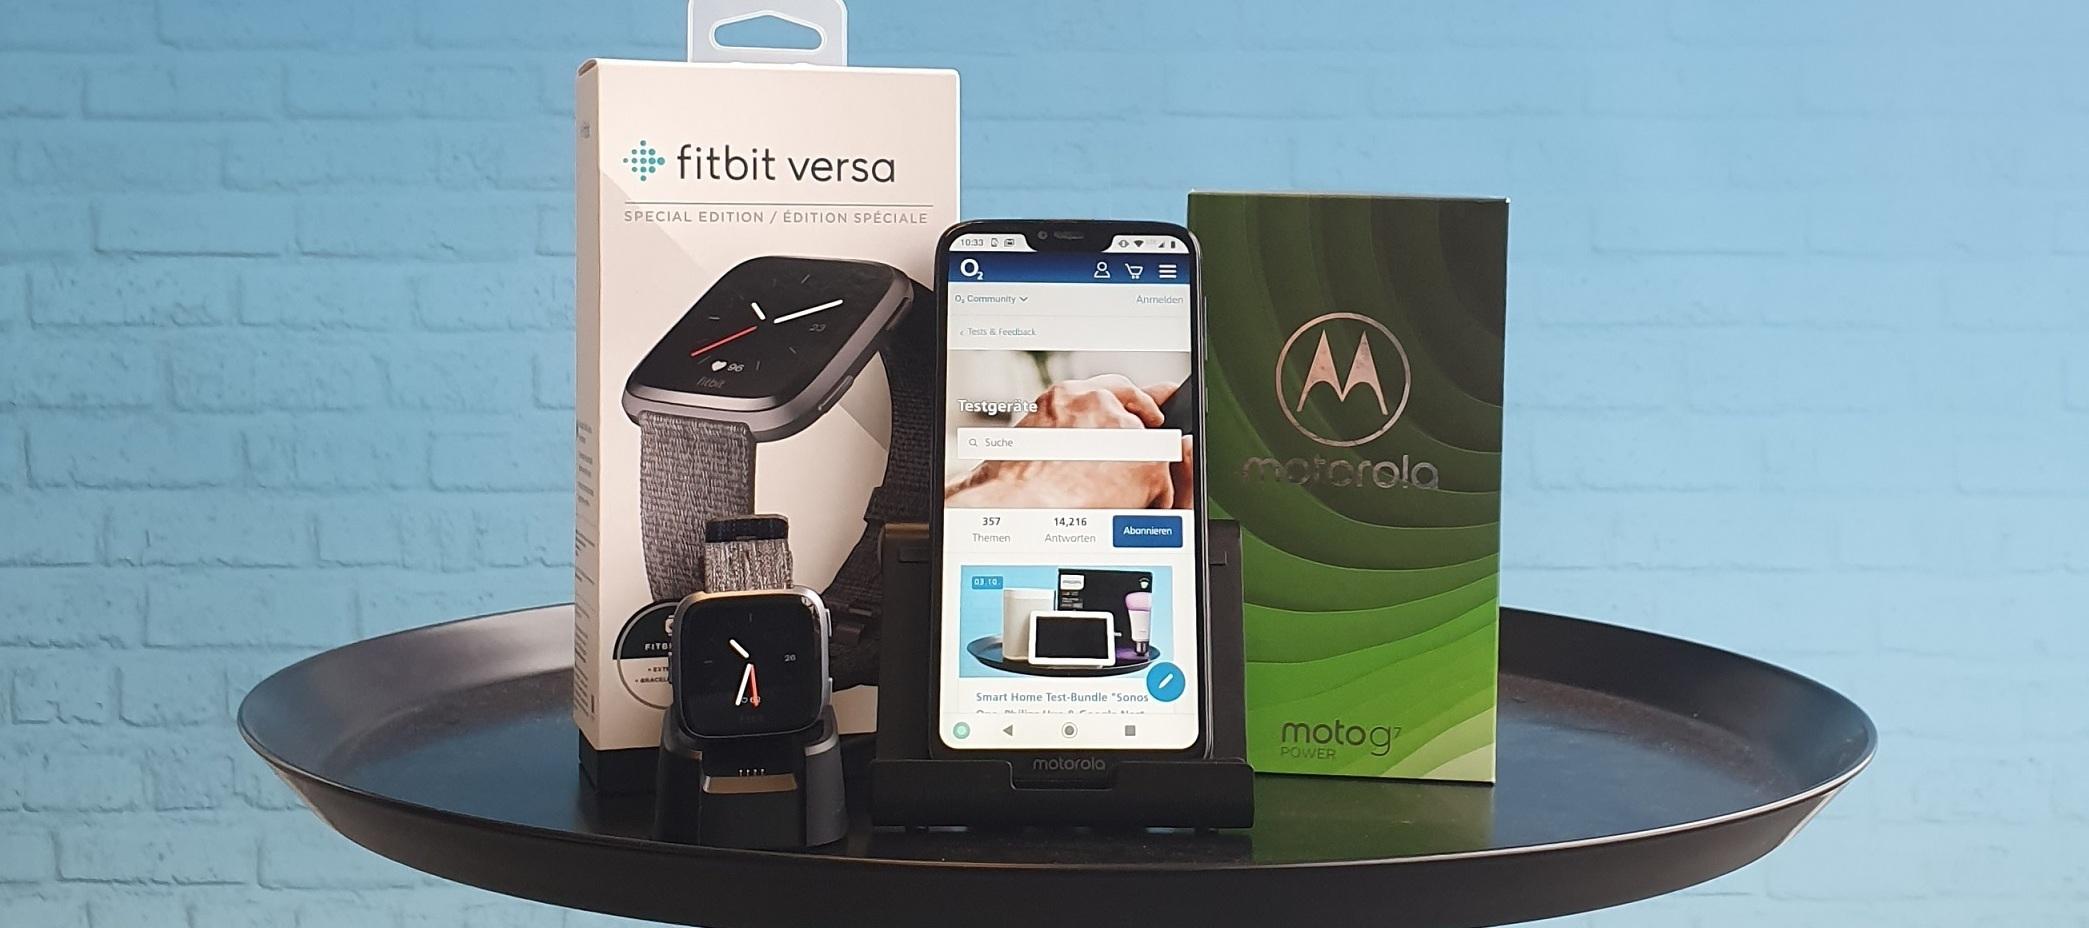 Motorola Moto G7 Power & Fitbit Versa Special Edition - Teste die Power!